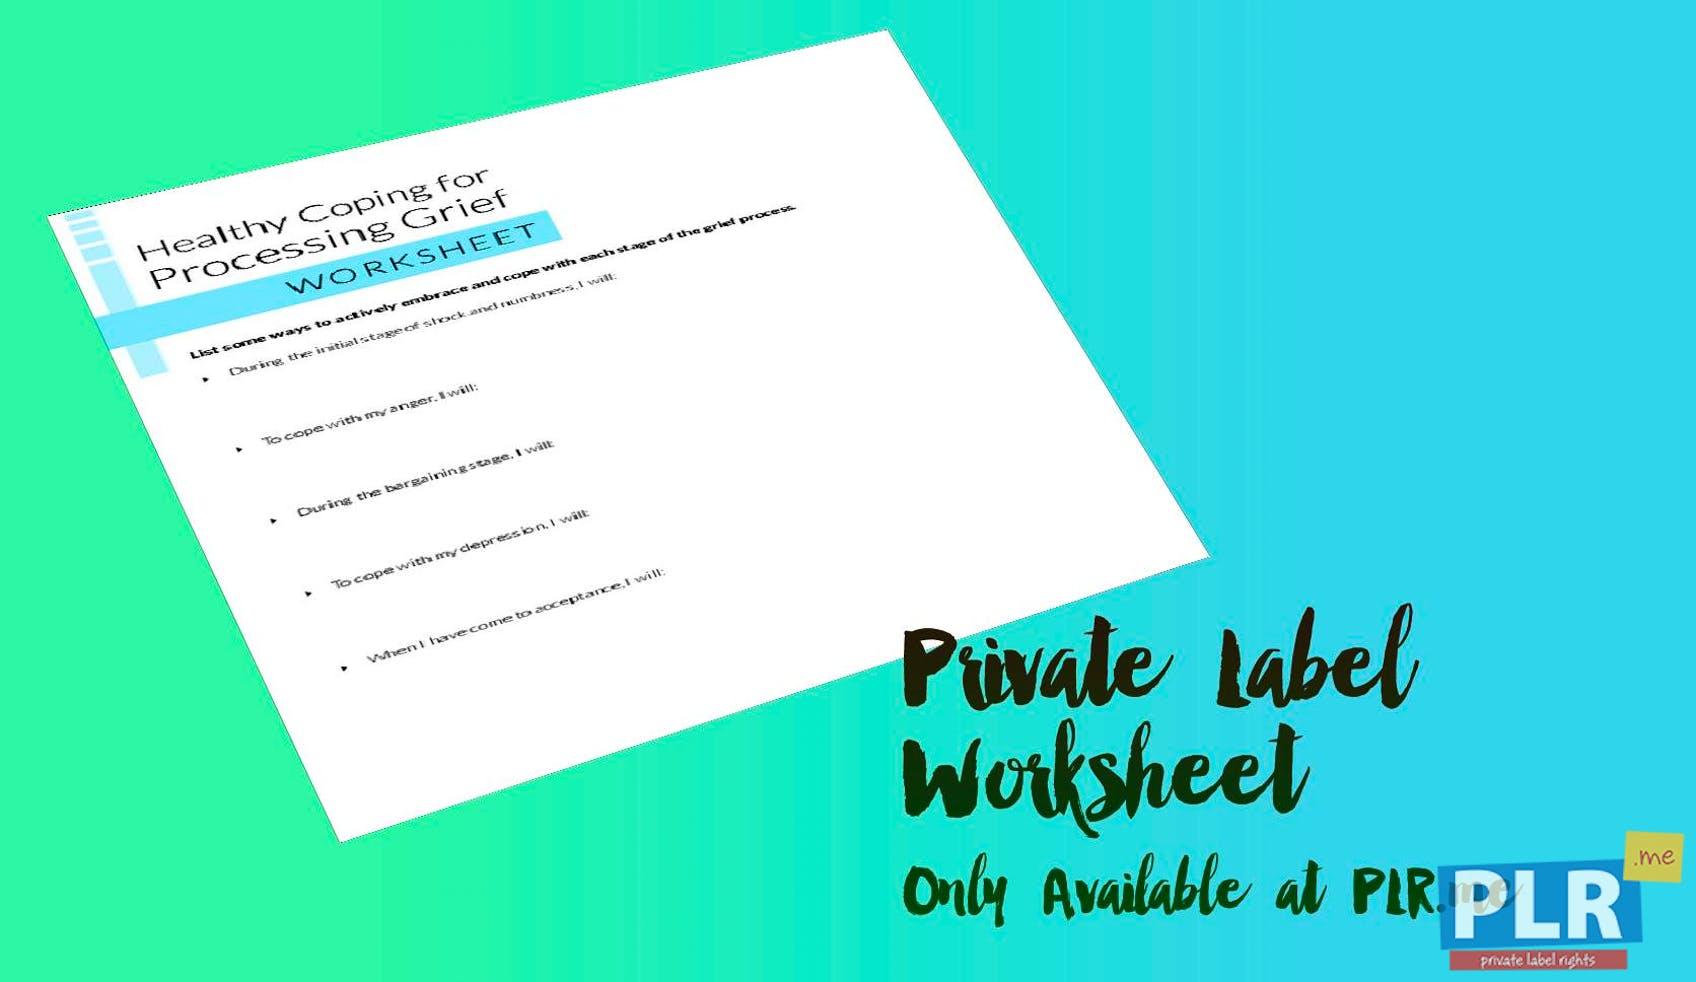 PLR Worksheets - Healthy Coping For Processing Grief Worksheet - PLR.me